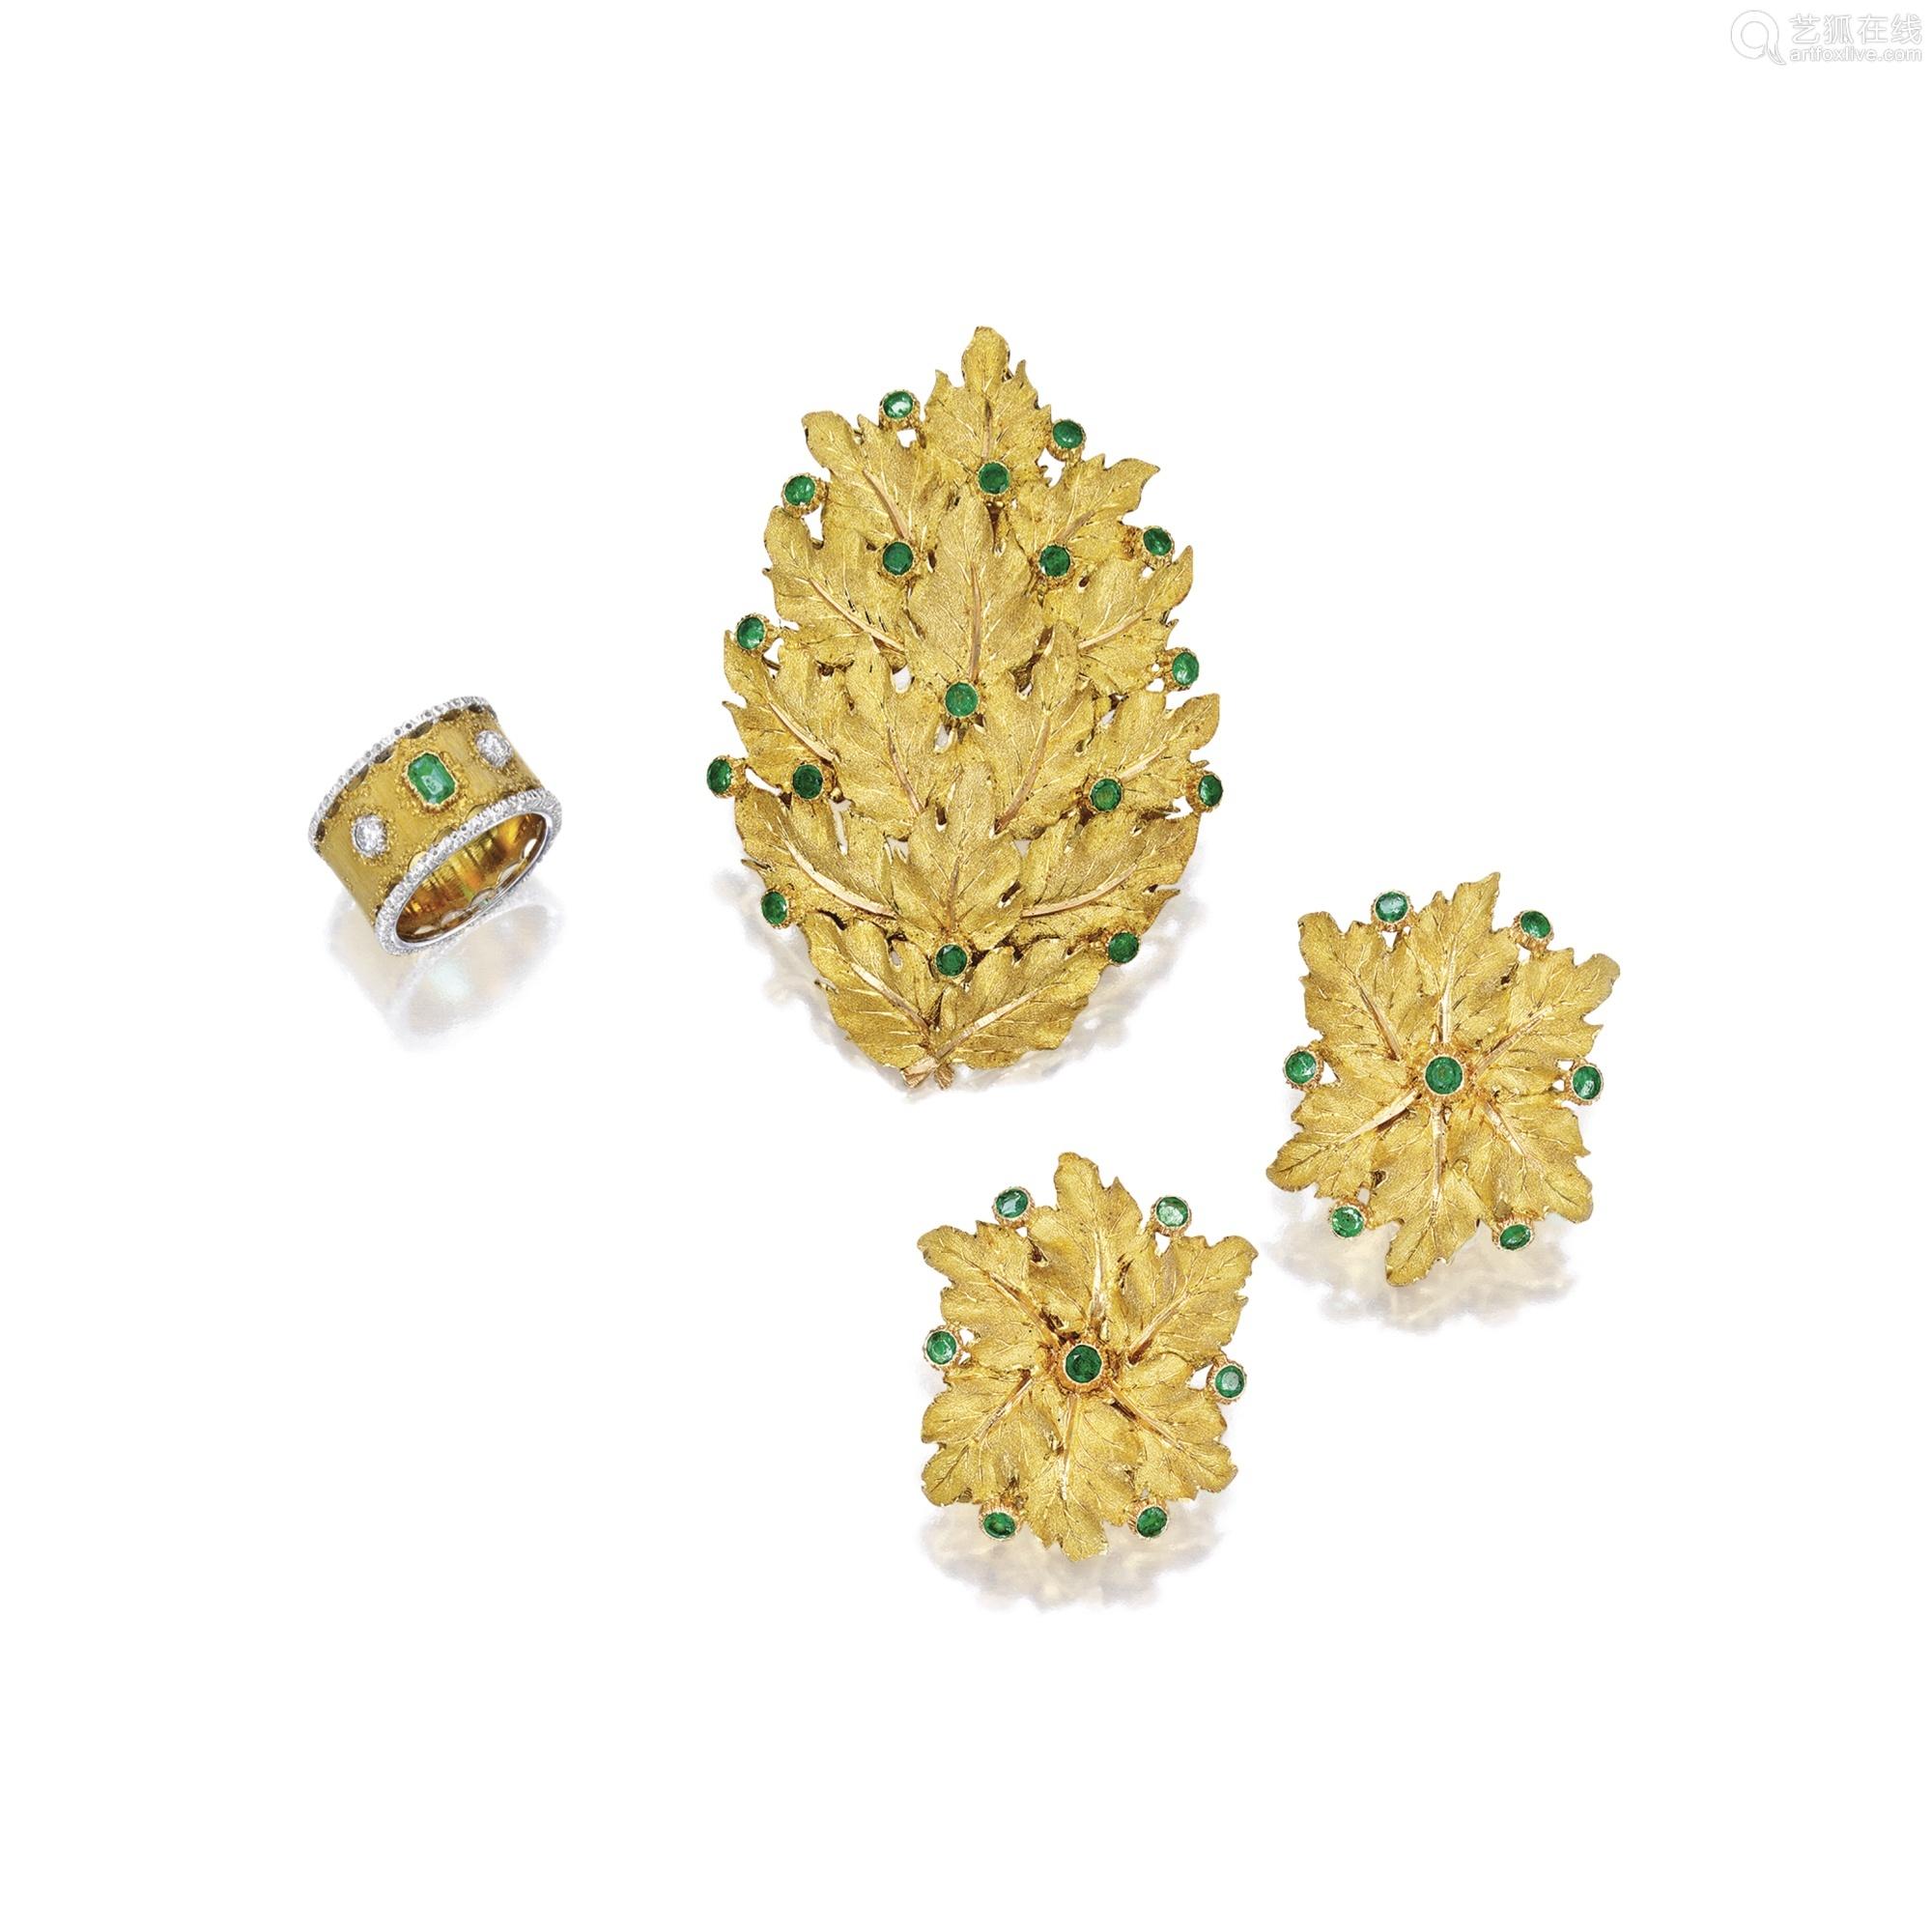 18K黄金祖母绿「叶子」别针及耳环套装 及祖母绿配钻石戒指 Gianmaria Buccellati